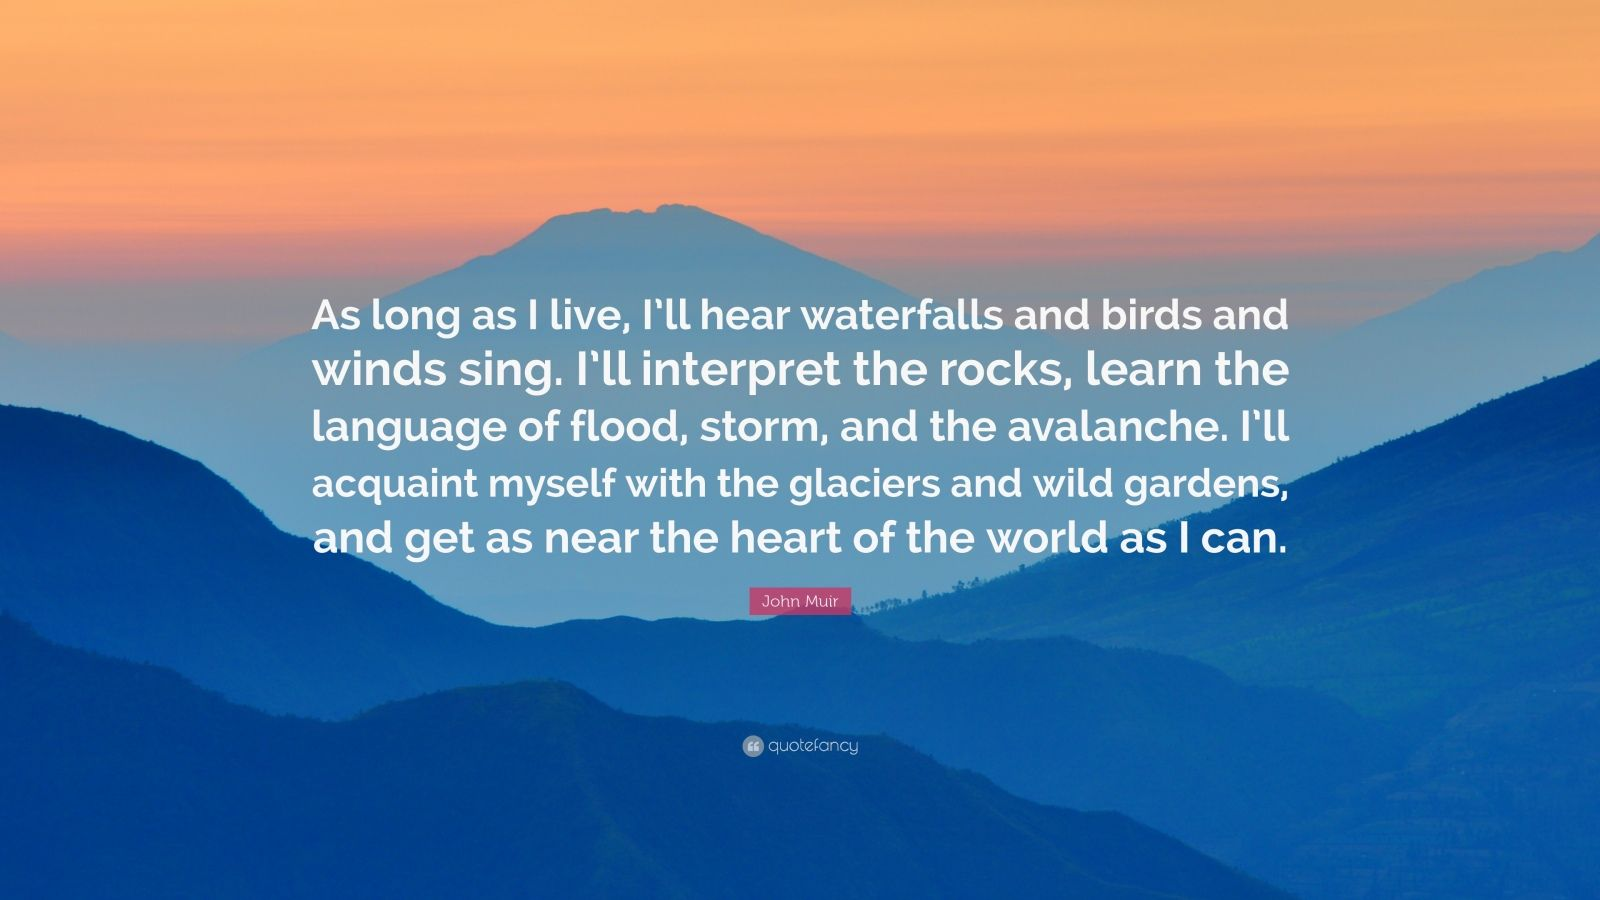 John Muir Quotes Wallpaper